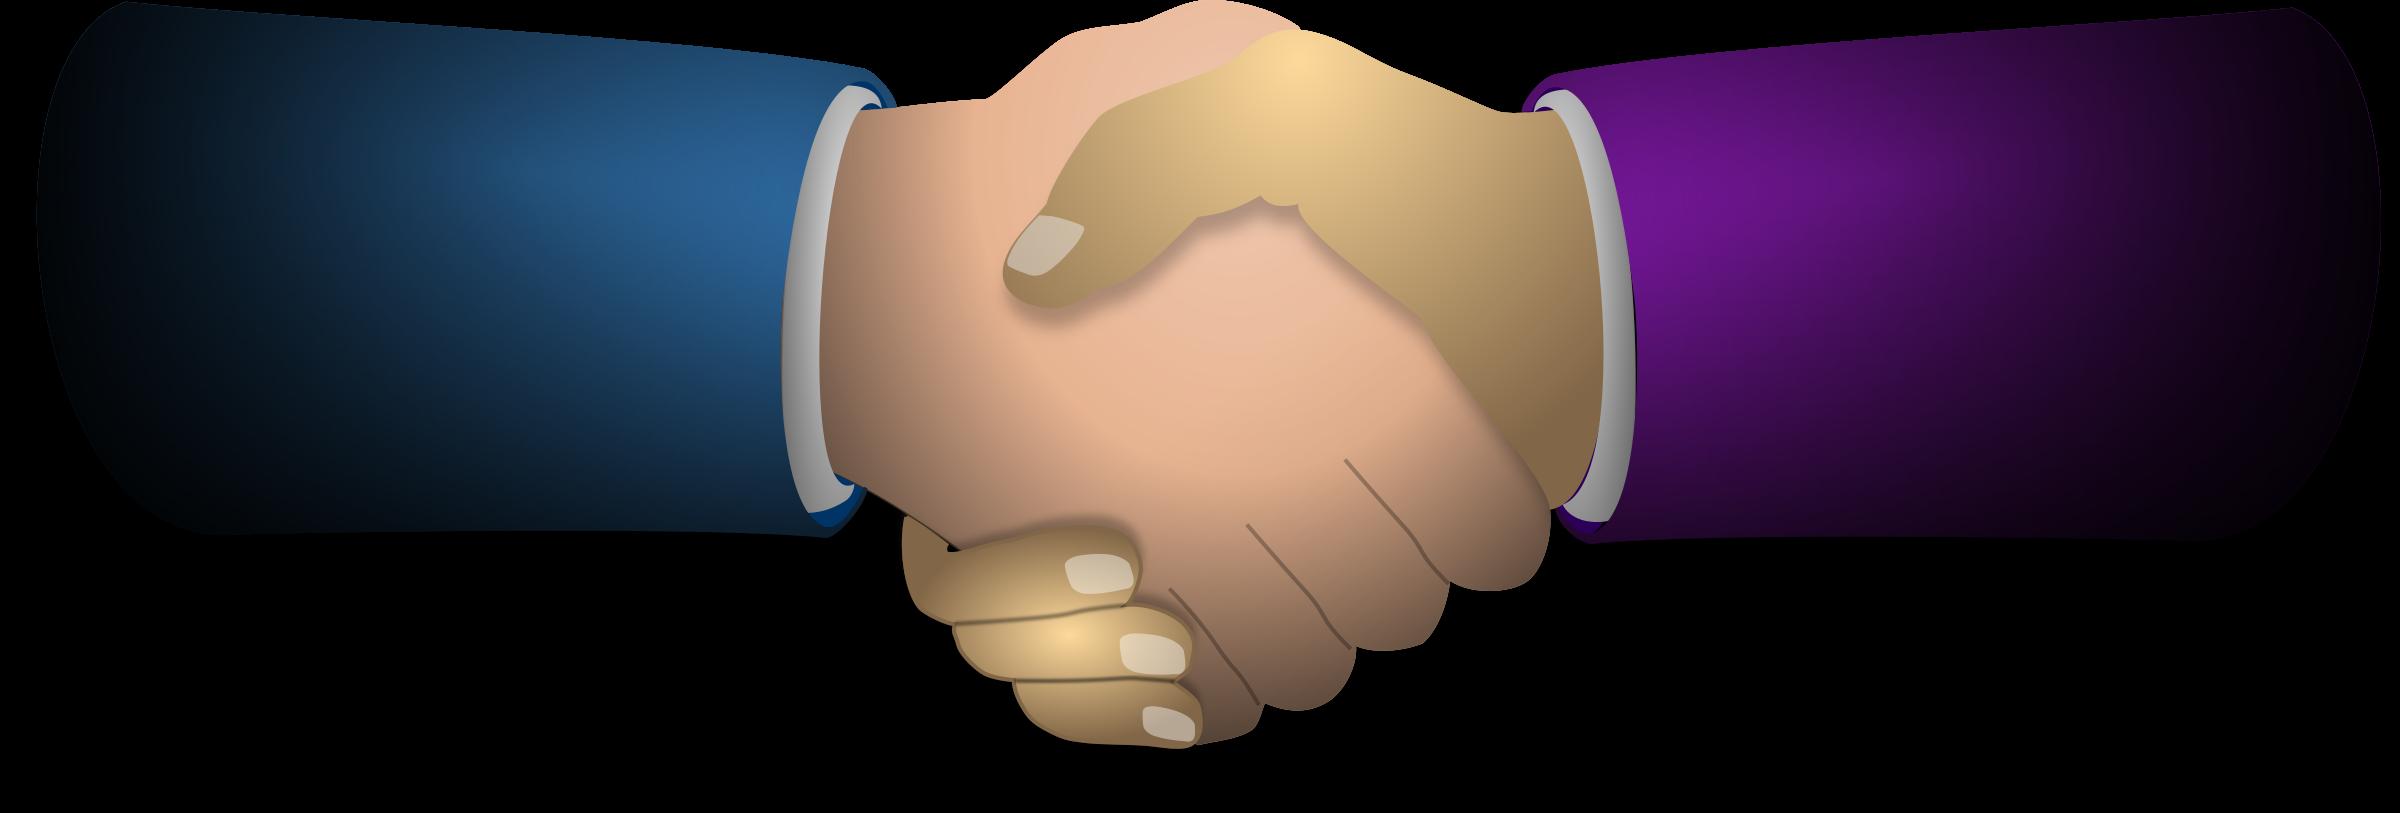 Handshake clipart colorful. Remix big image png